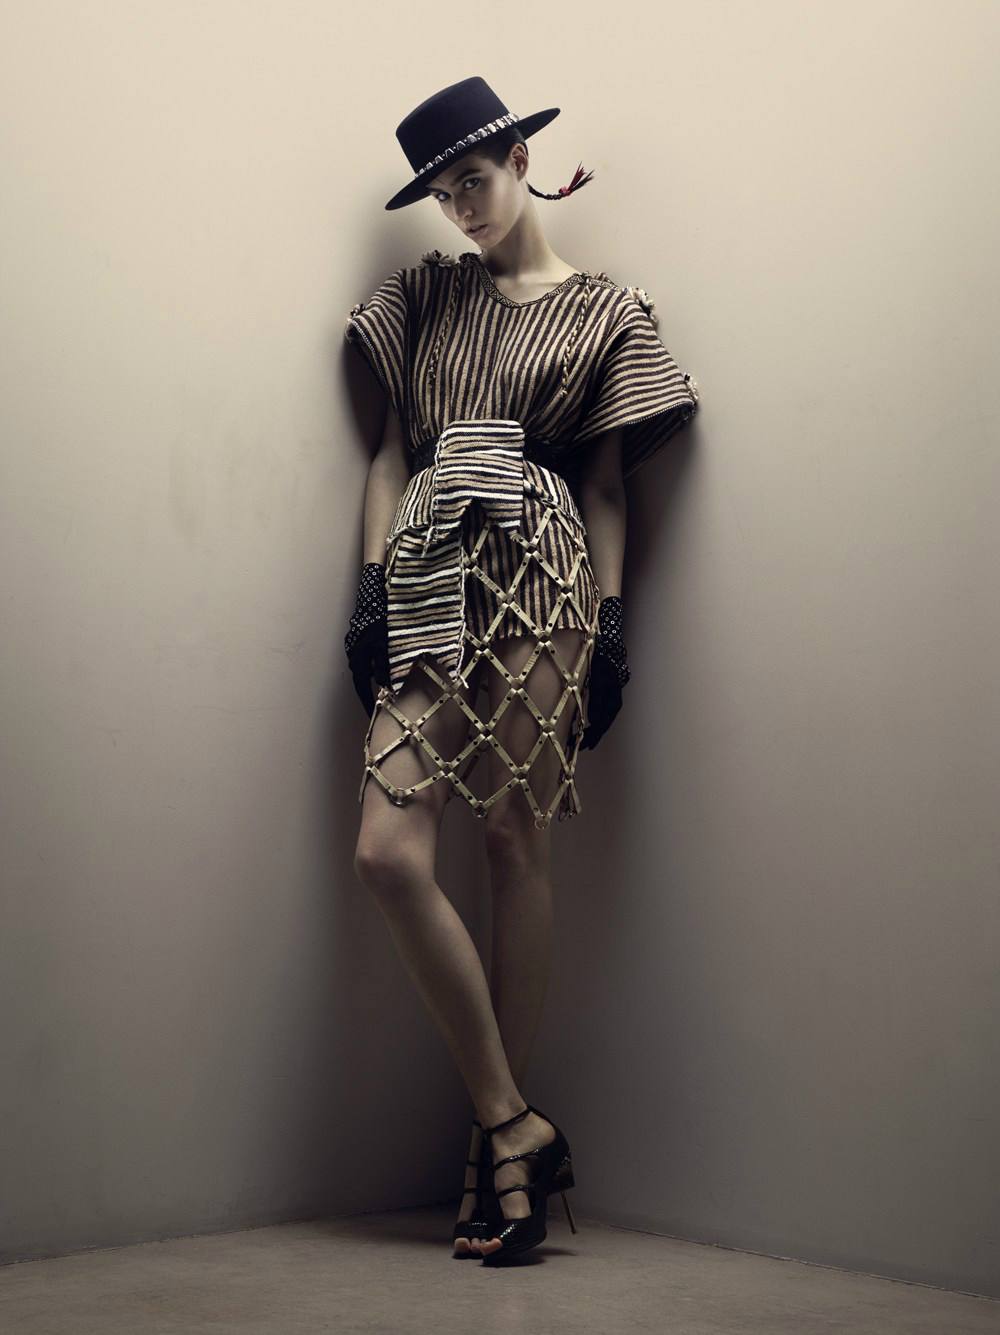 toby-knott-manon-leloup-stylist-magazine-5.jpg